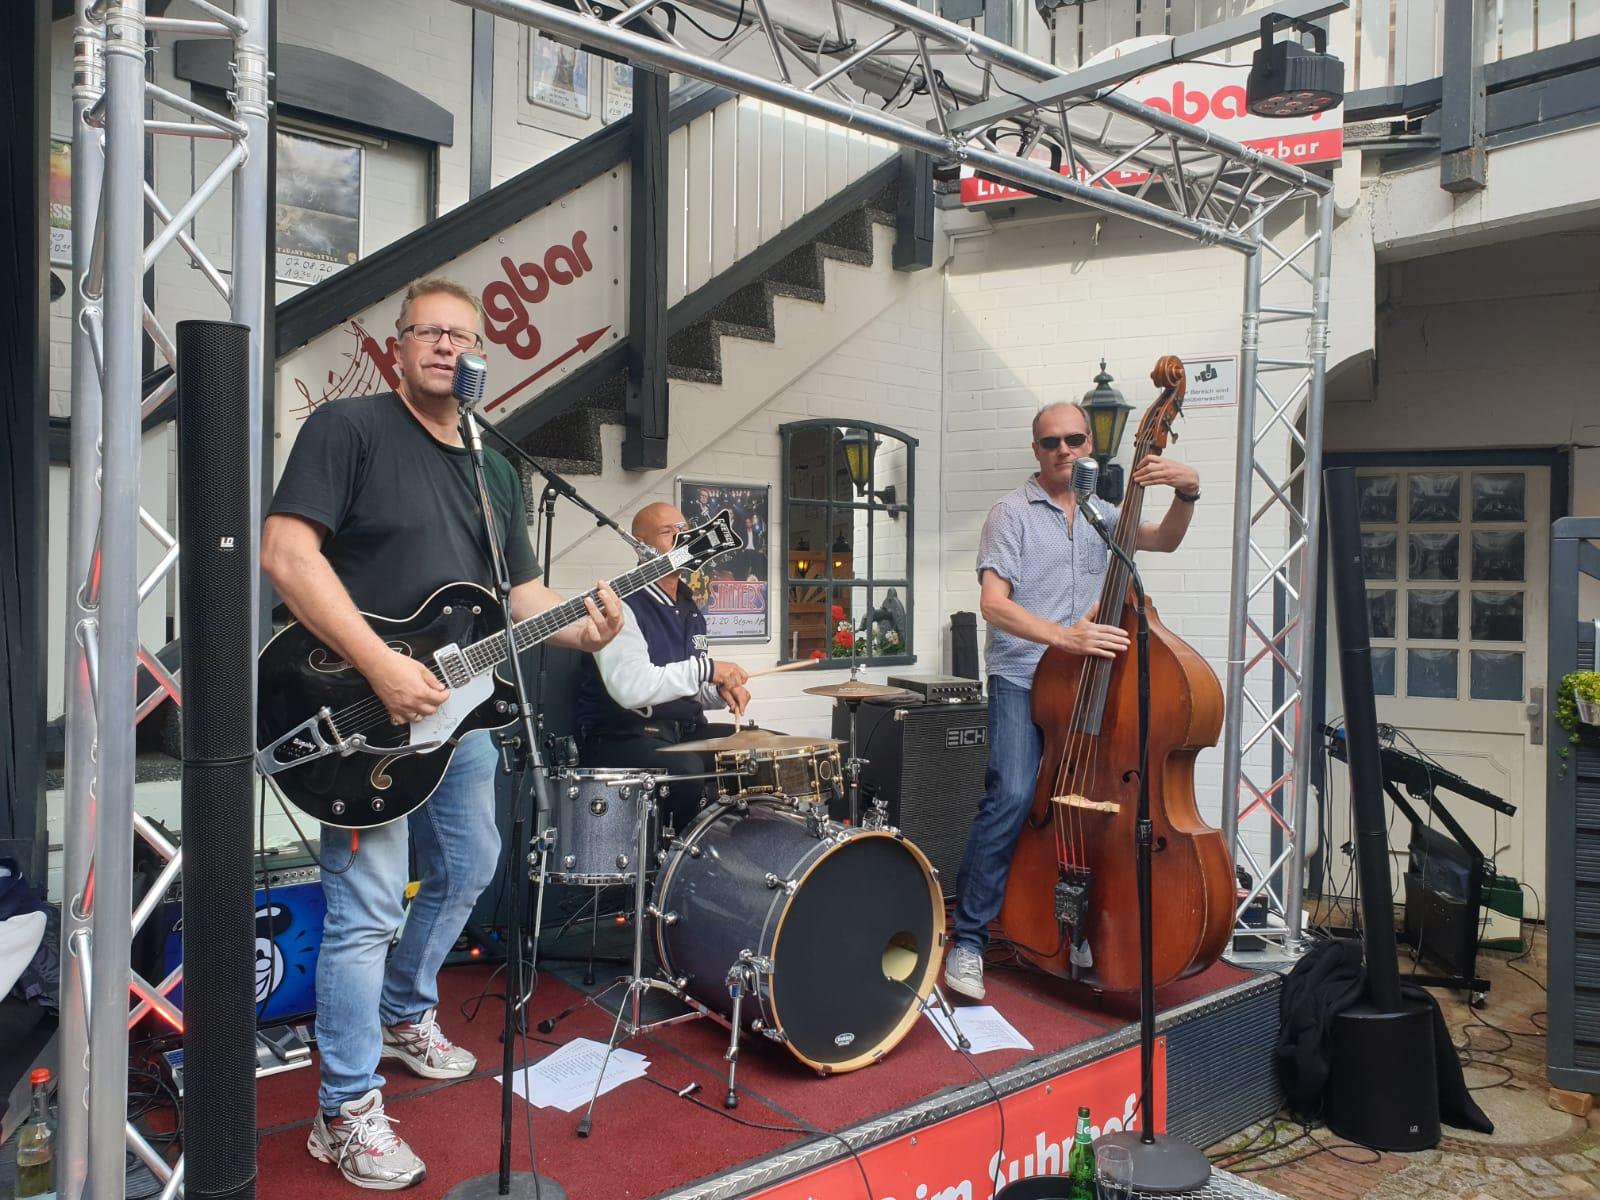 The Sinners, Rock am Bergedorfer Hafen, Tatenberger Bucht, Live-Konzert, Die Junx, Rock'n'Roll, Deutschpop, Schlager, Open Air, Nachrichten, Hamburg, Bergedorf, Wasserweg